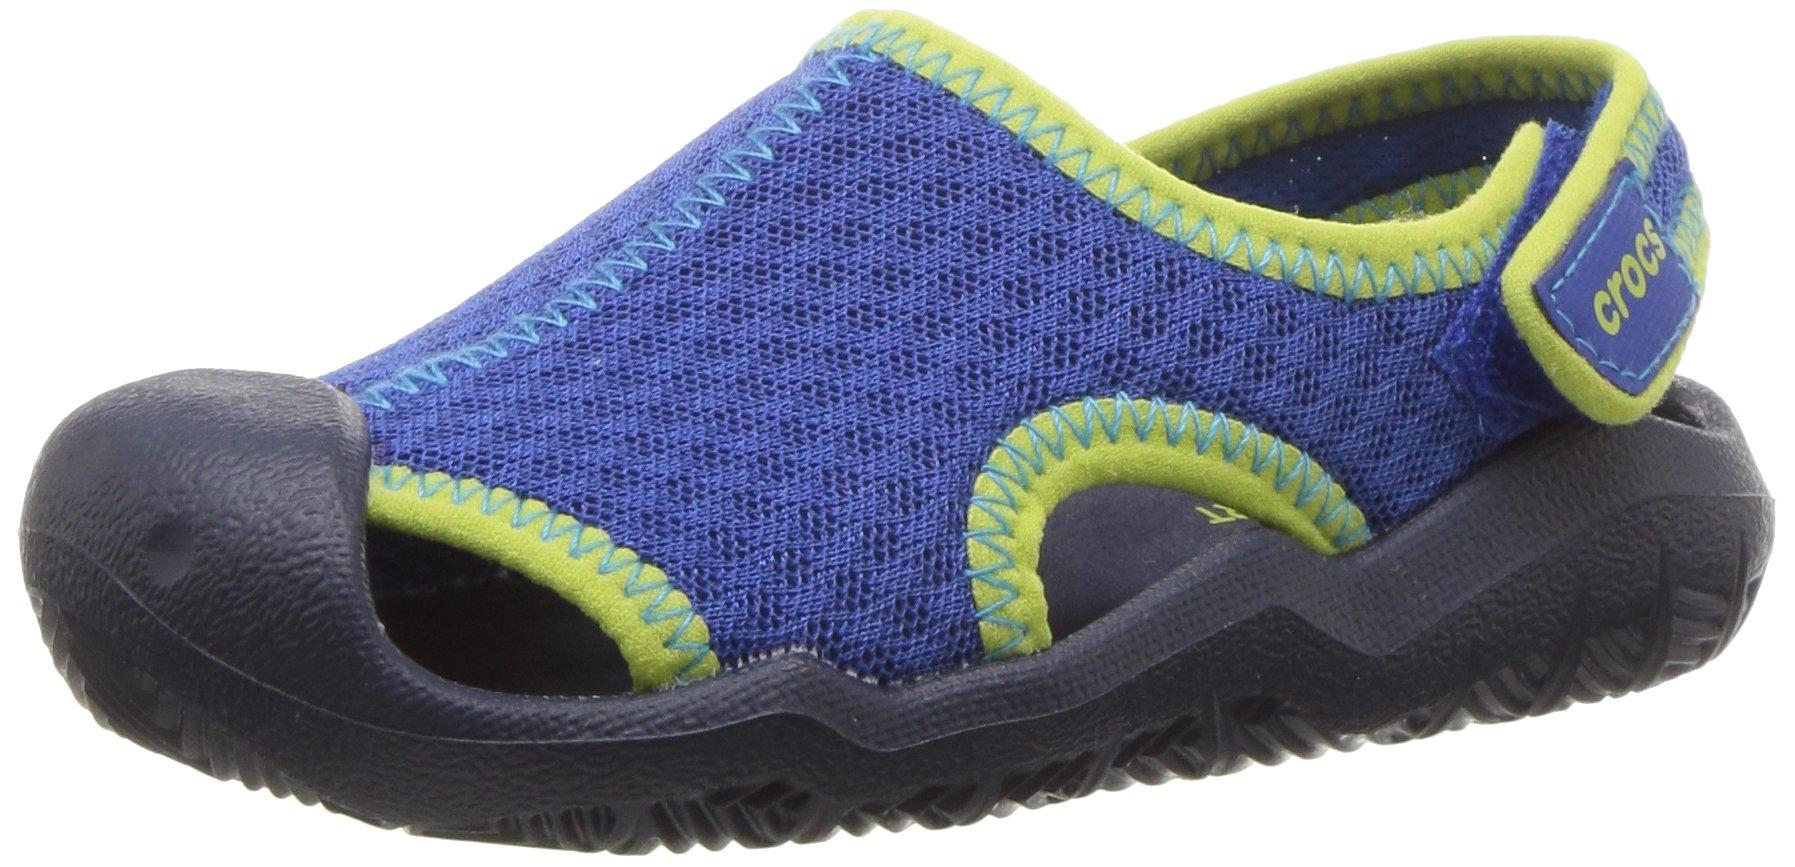 Crocs Kids' Swiftwater Sandal K,blue jean/navy,8 M US Toddler